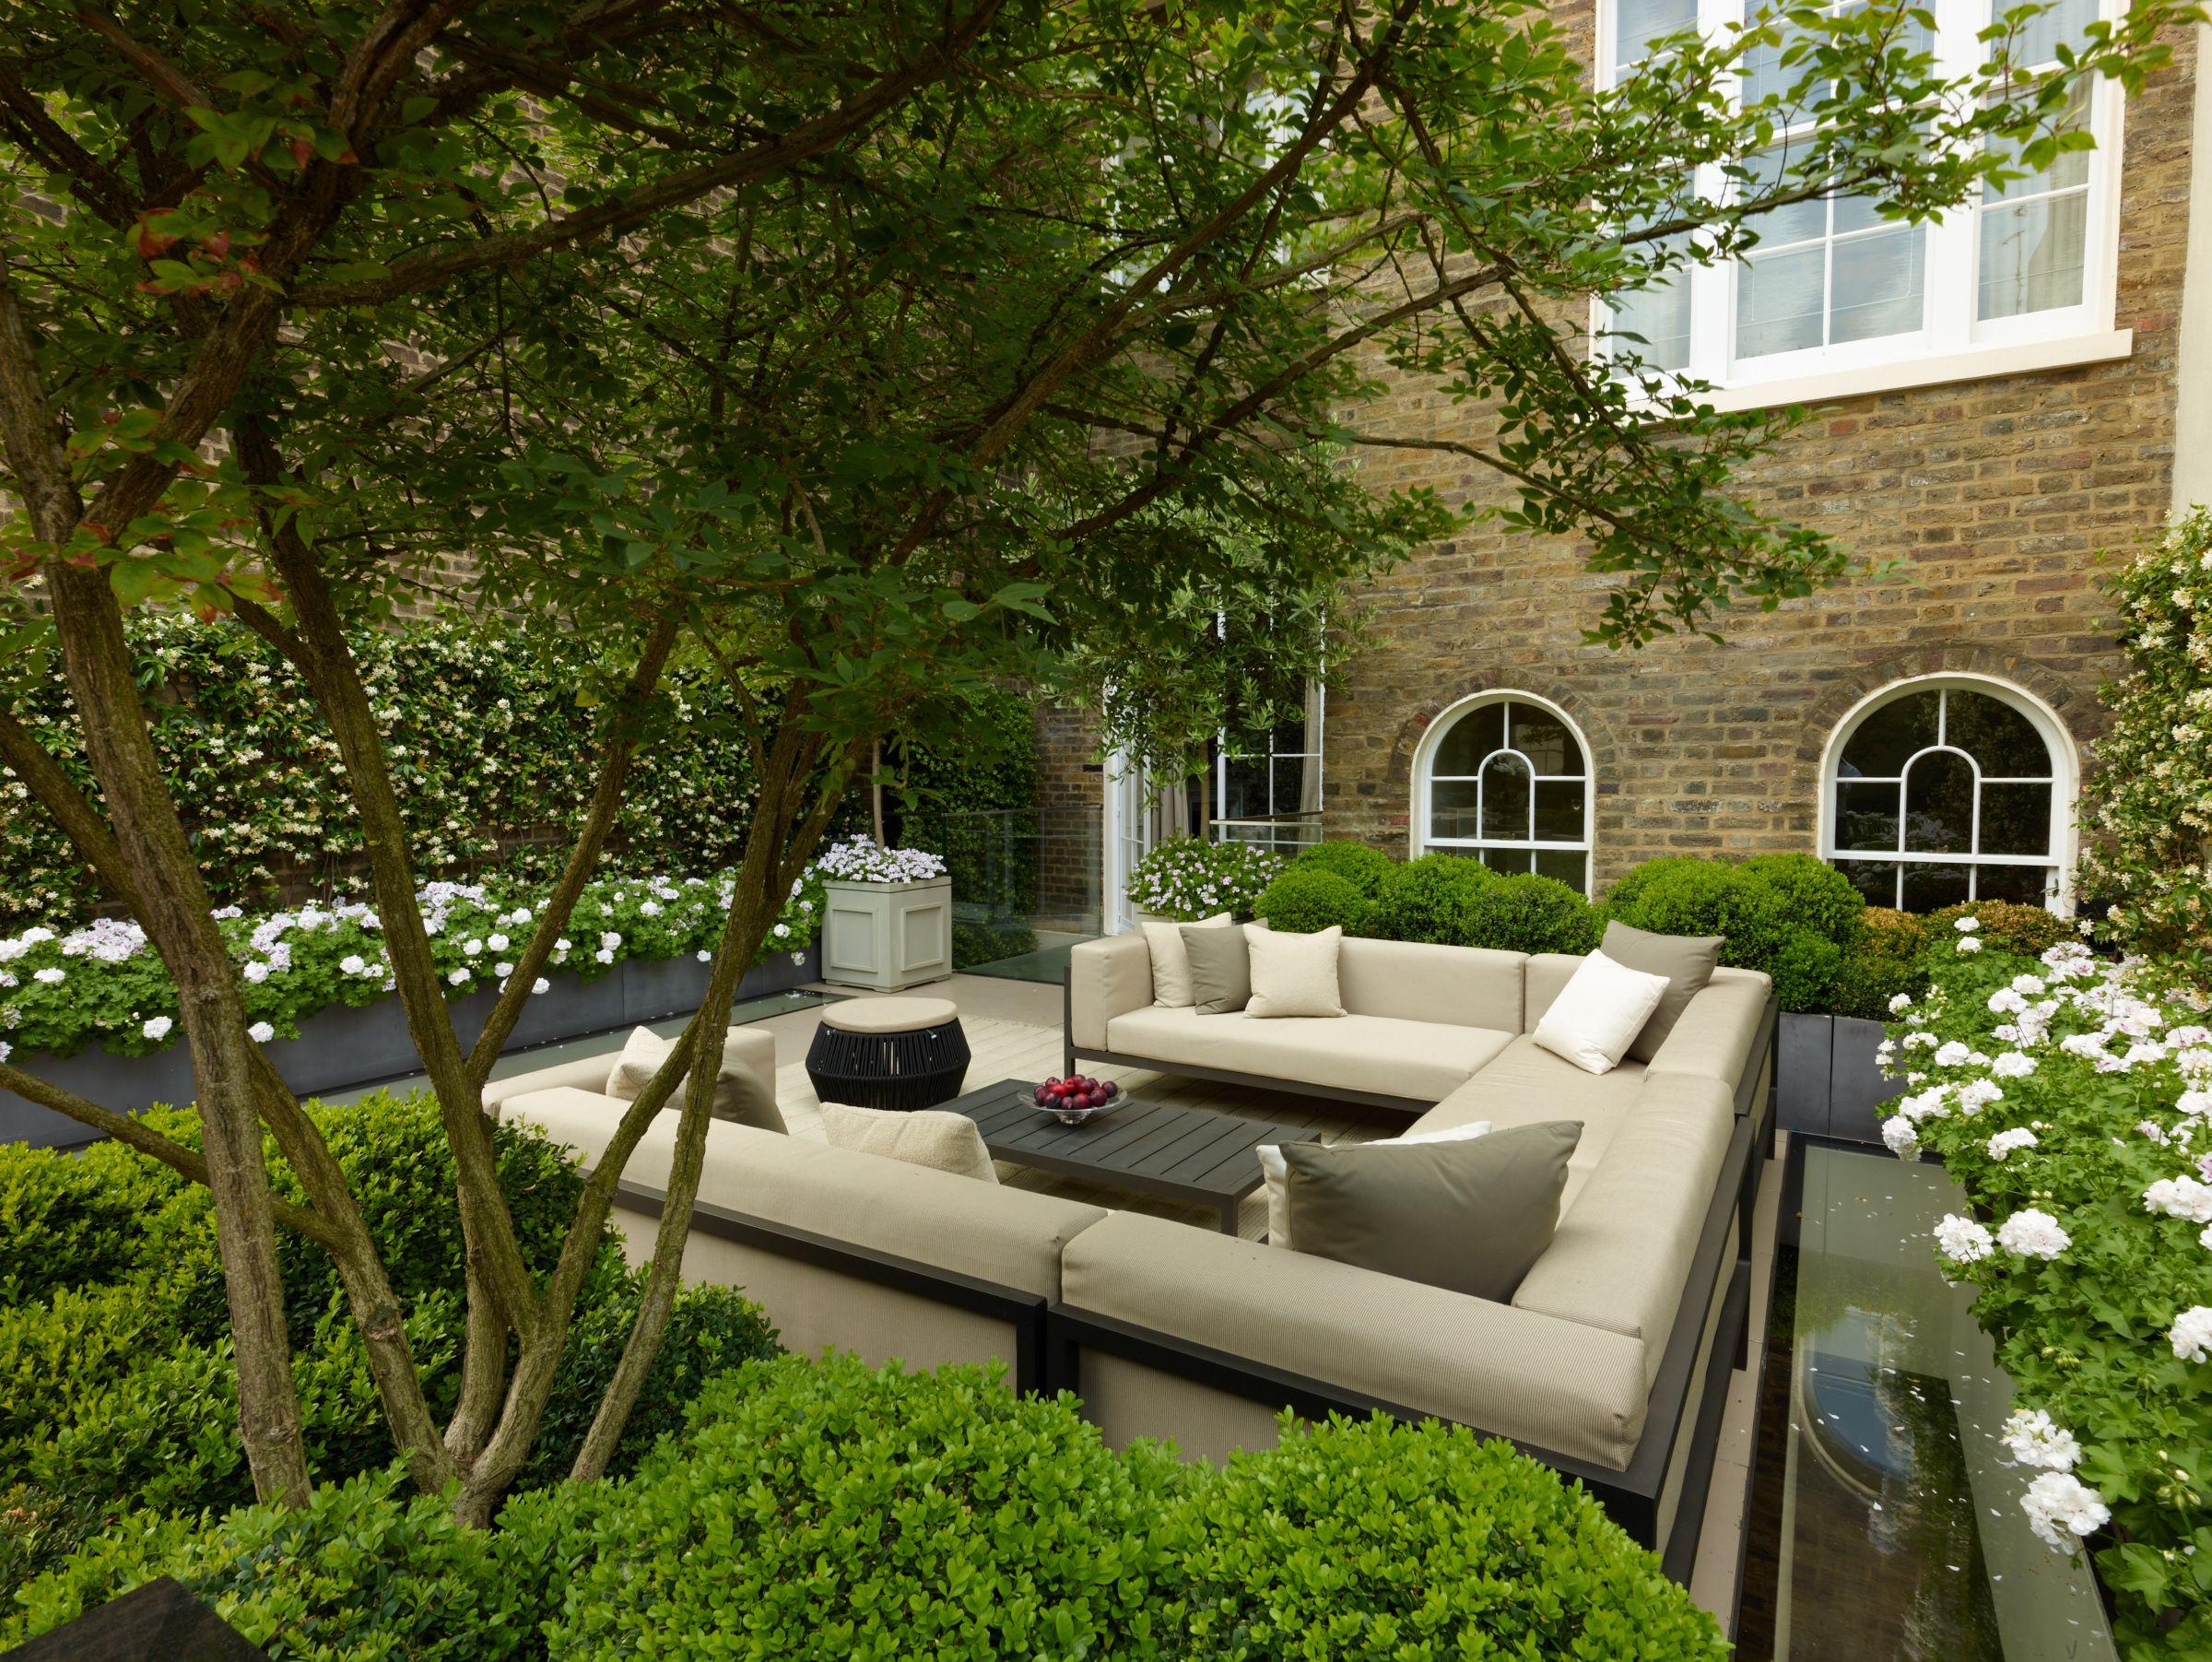 john wyer garden design eaton square residential garden london